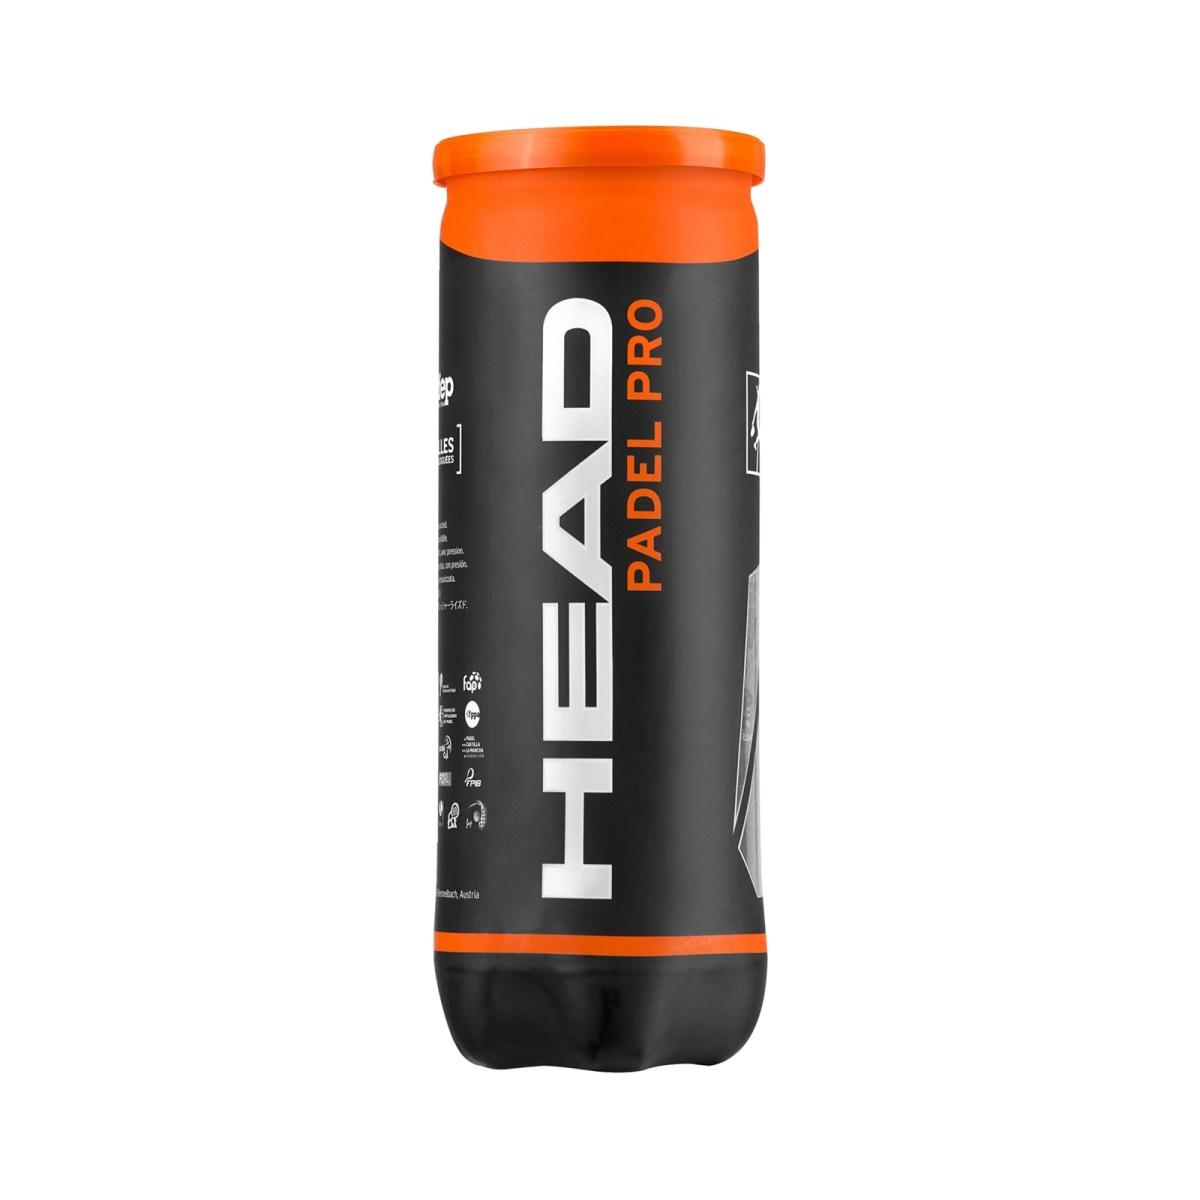 Head Padel Pro ball